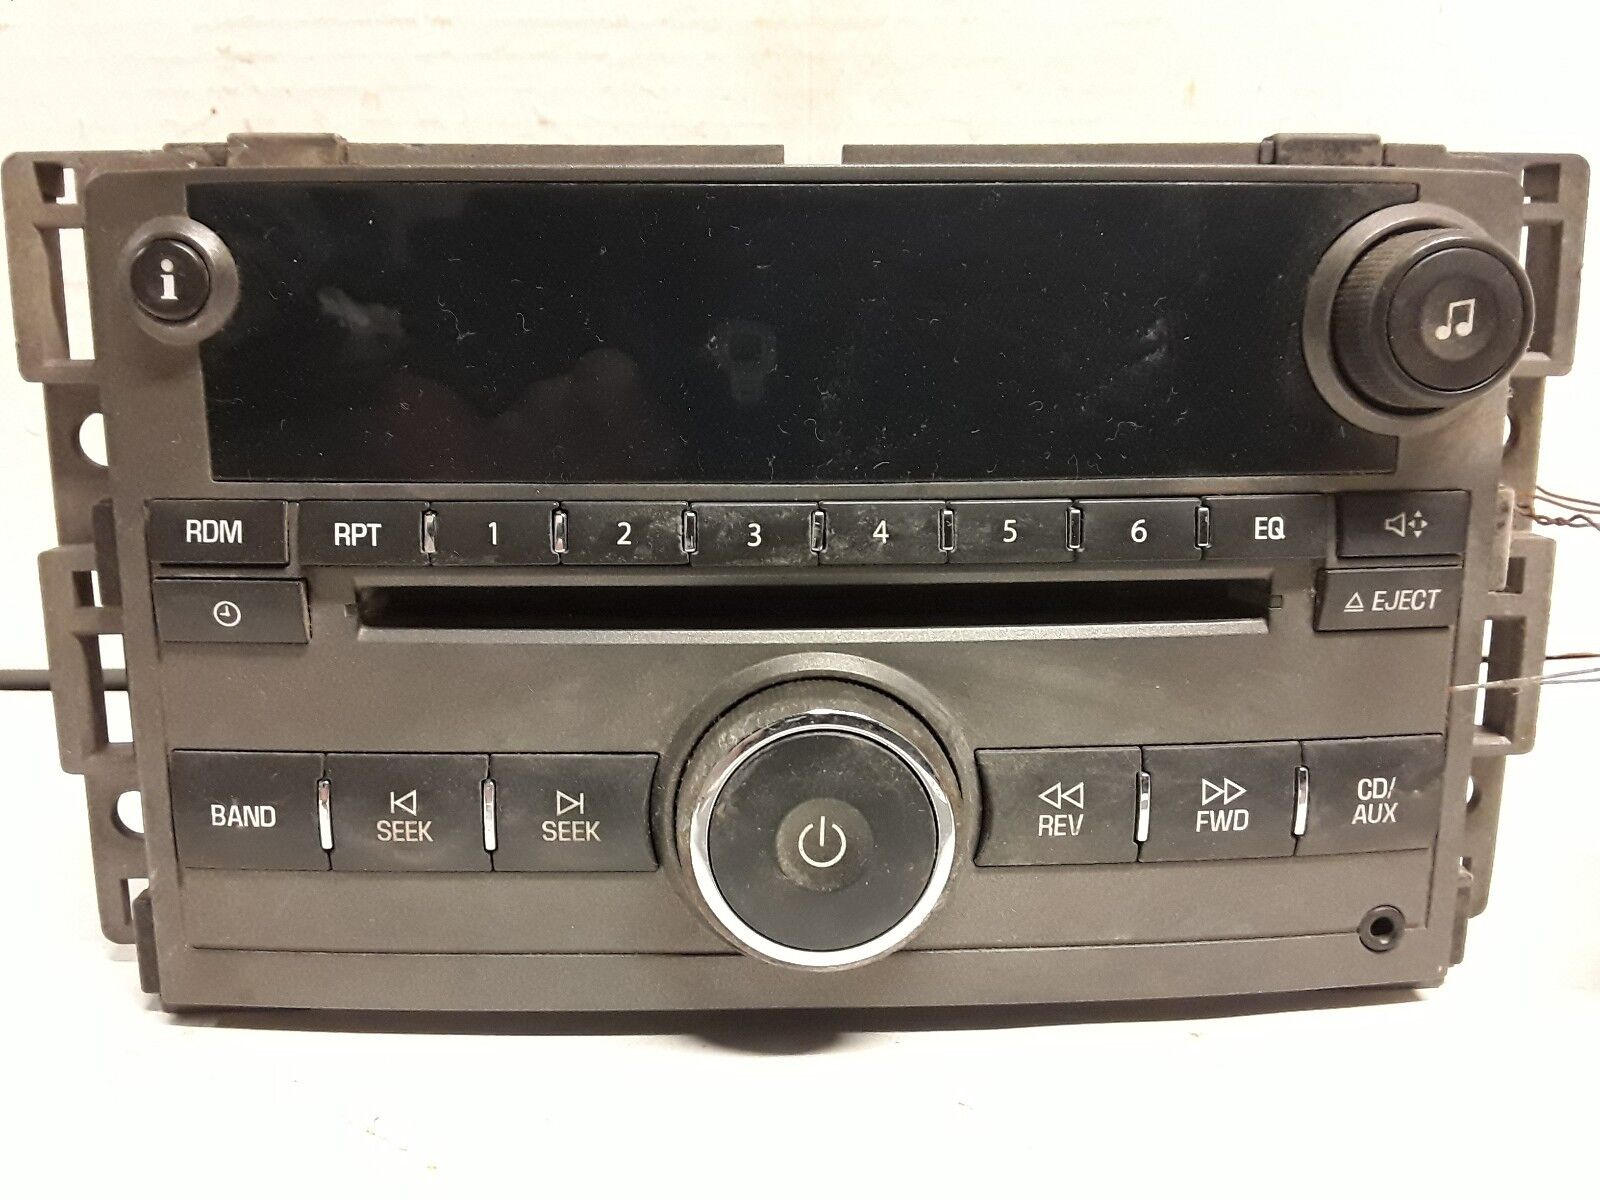 06 07 08 Chevy HHR AM FM CD radio receiver OEM 15812373